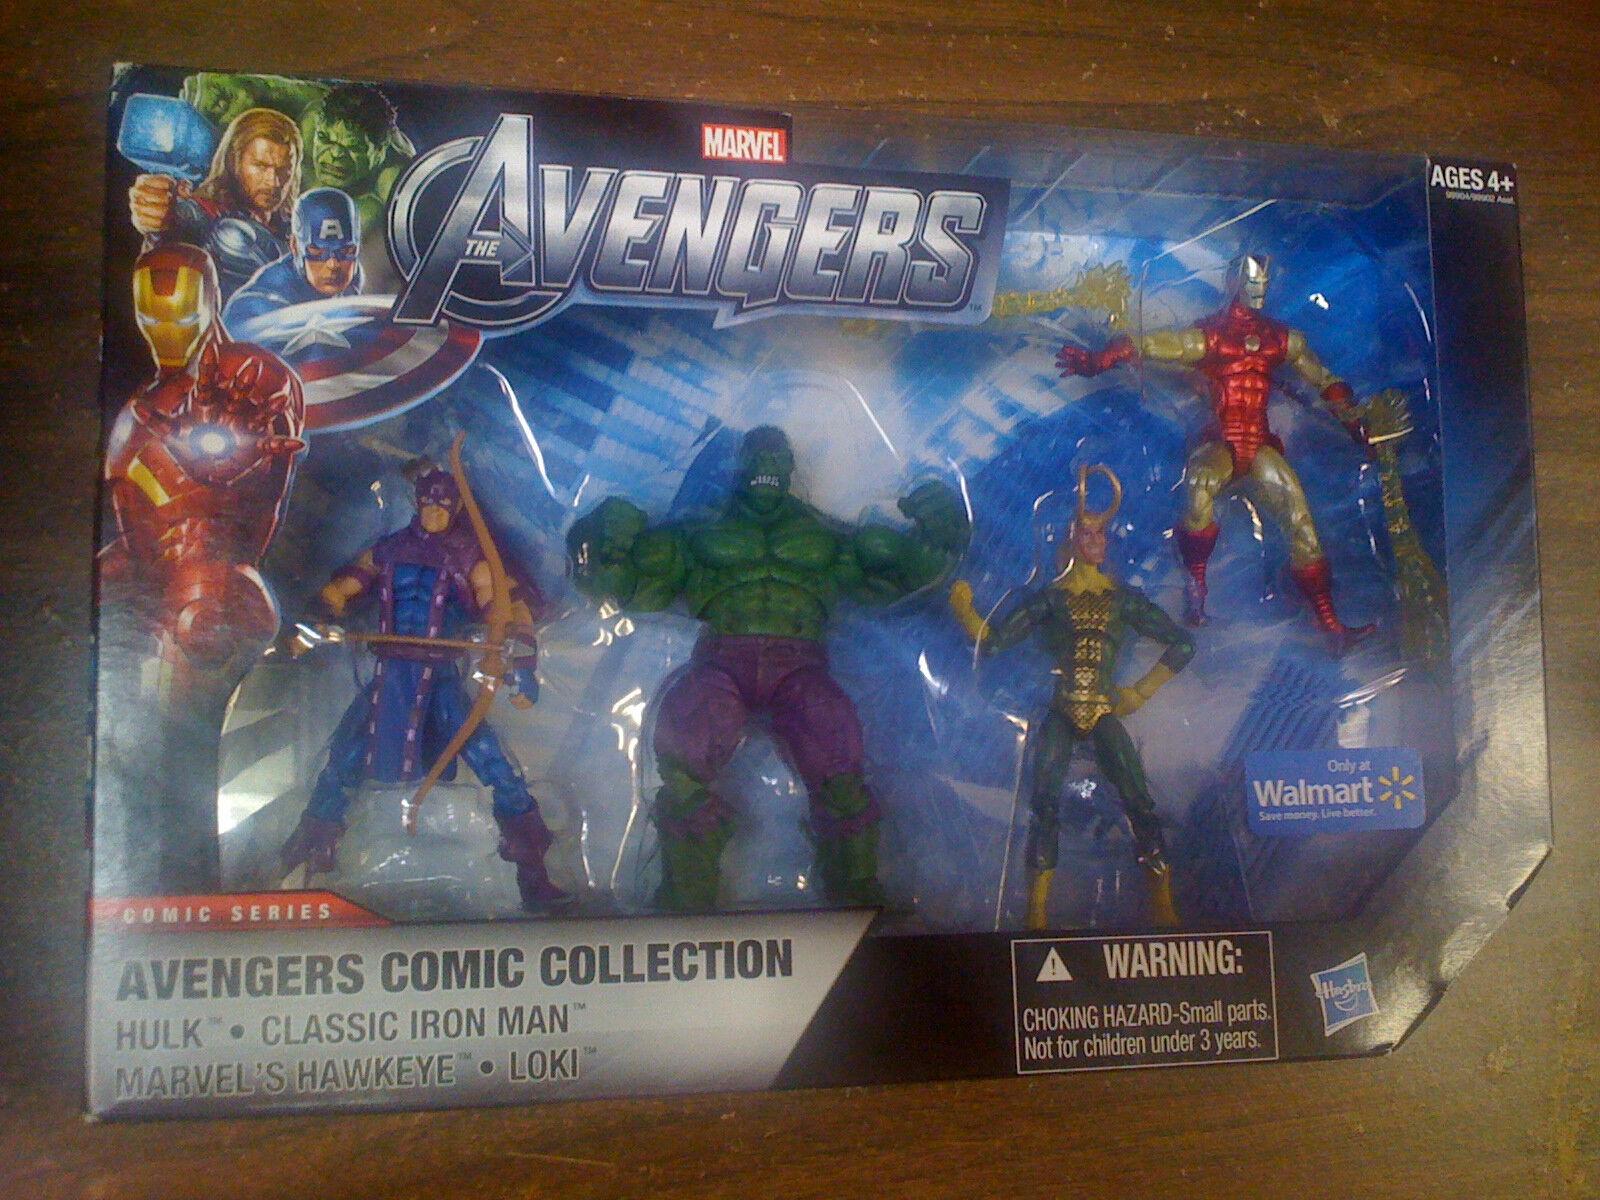 Marvel Universe Avengers Collection Hulk Classic Classic Classic Iron Man  Loki NEW FREE SHIP US 3b0456